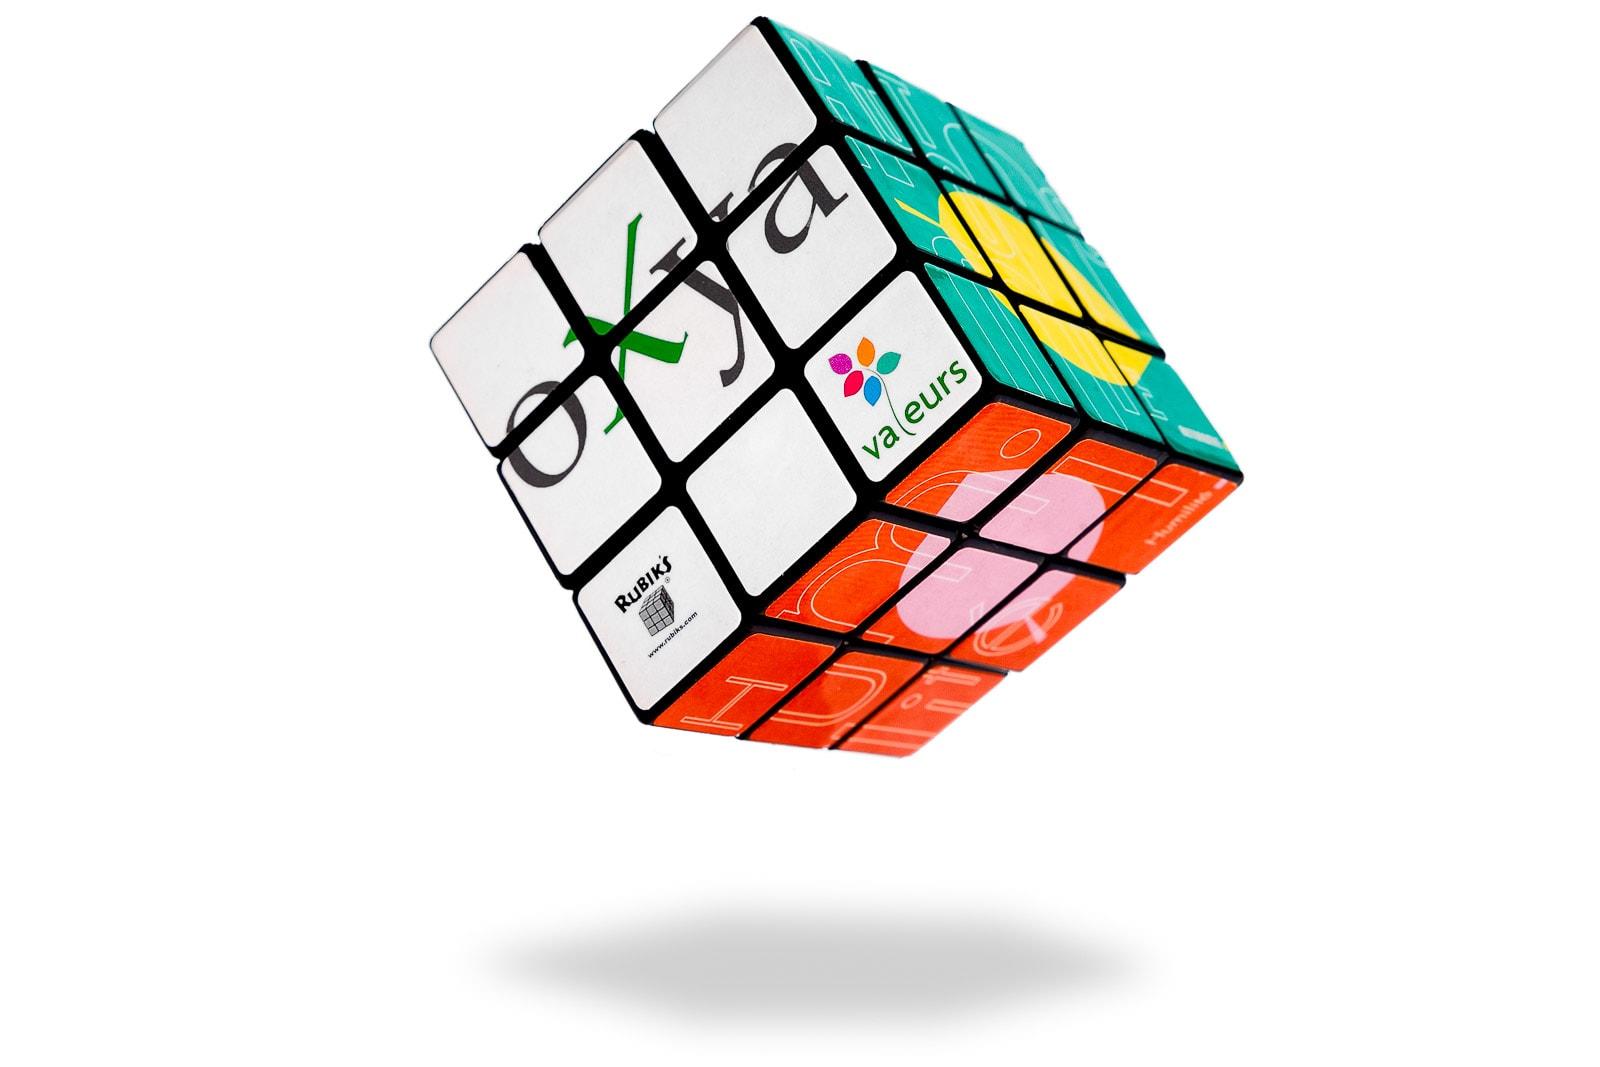 floating oxya rubiks cube business merchandise on white background